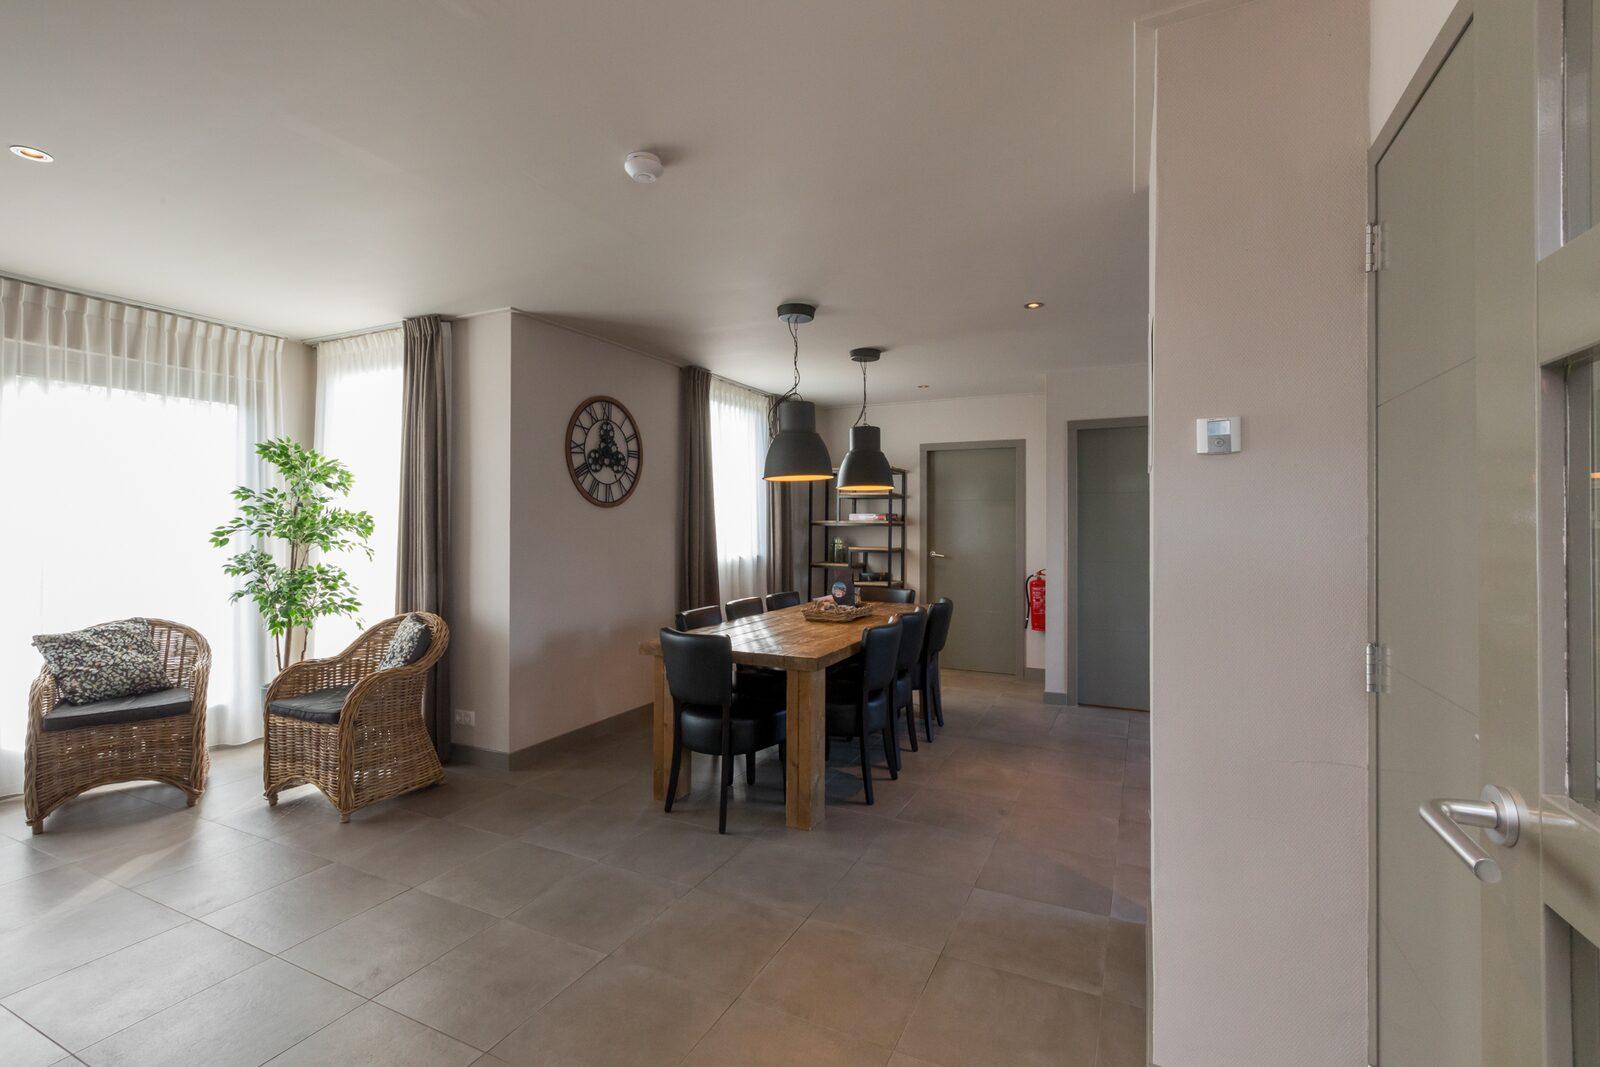 Ferienhaus - Oostkapelsweg 32 | Serooskerke 'Reiger'